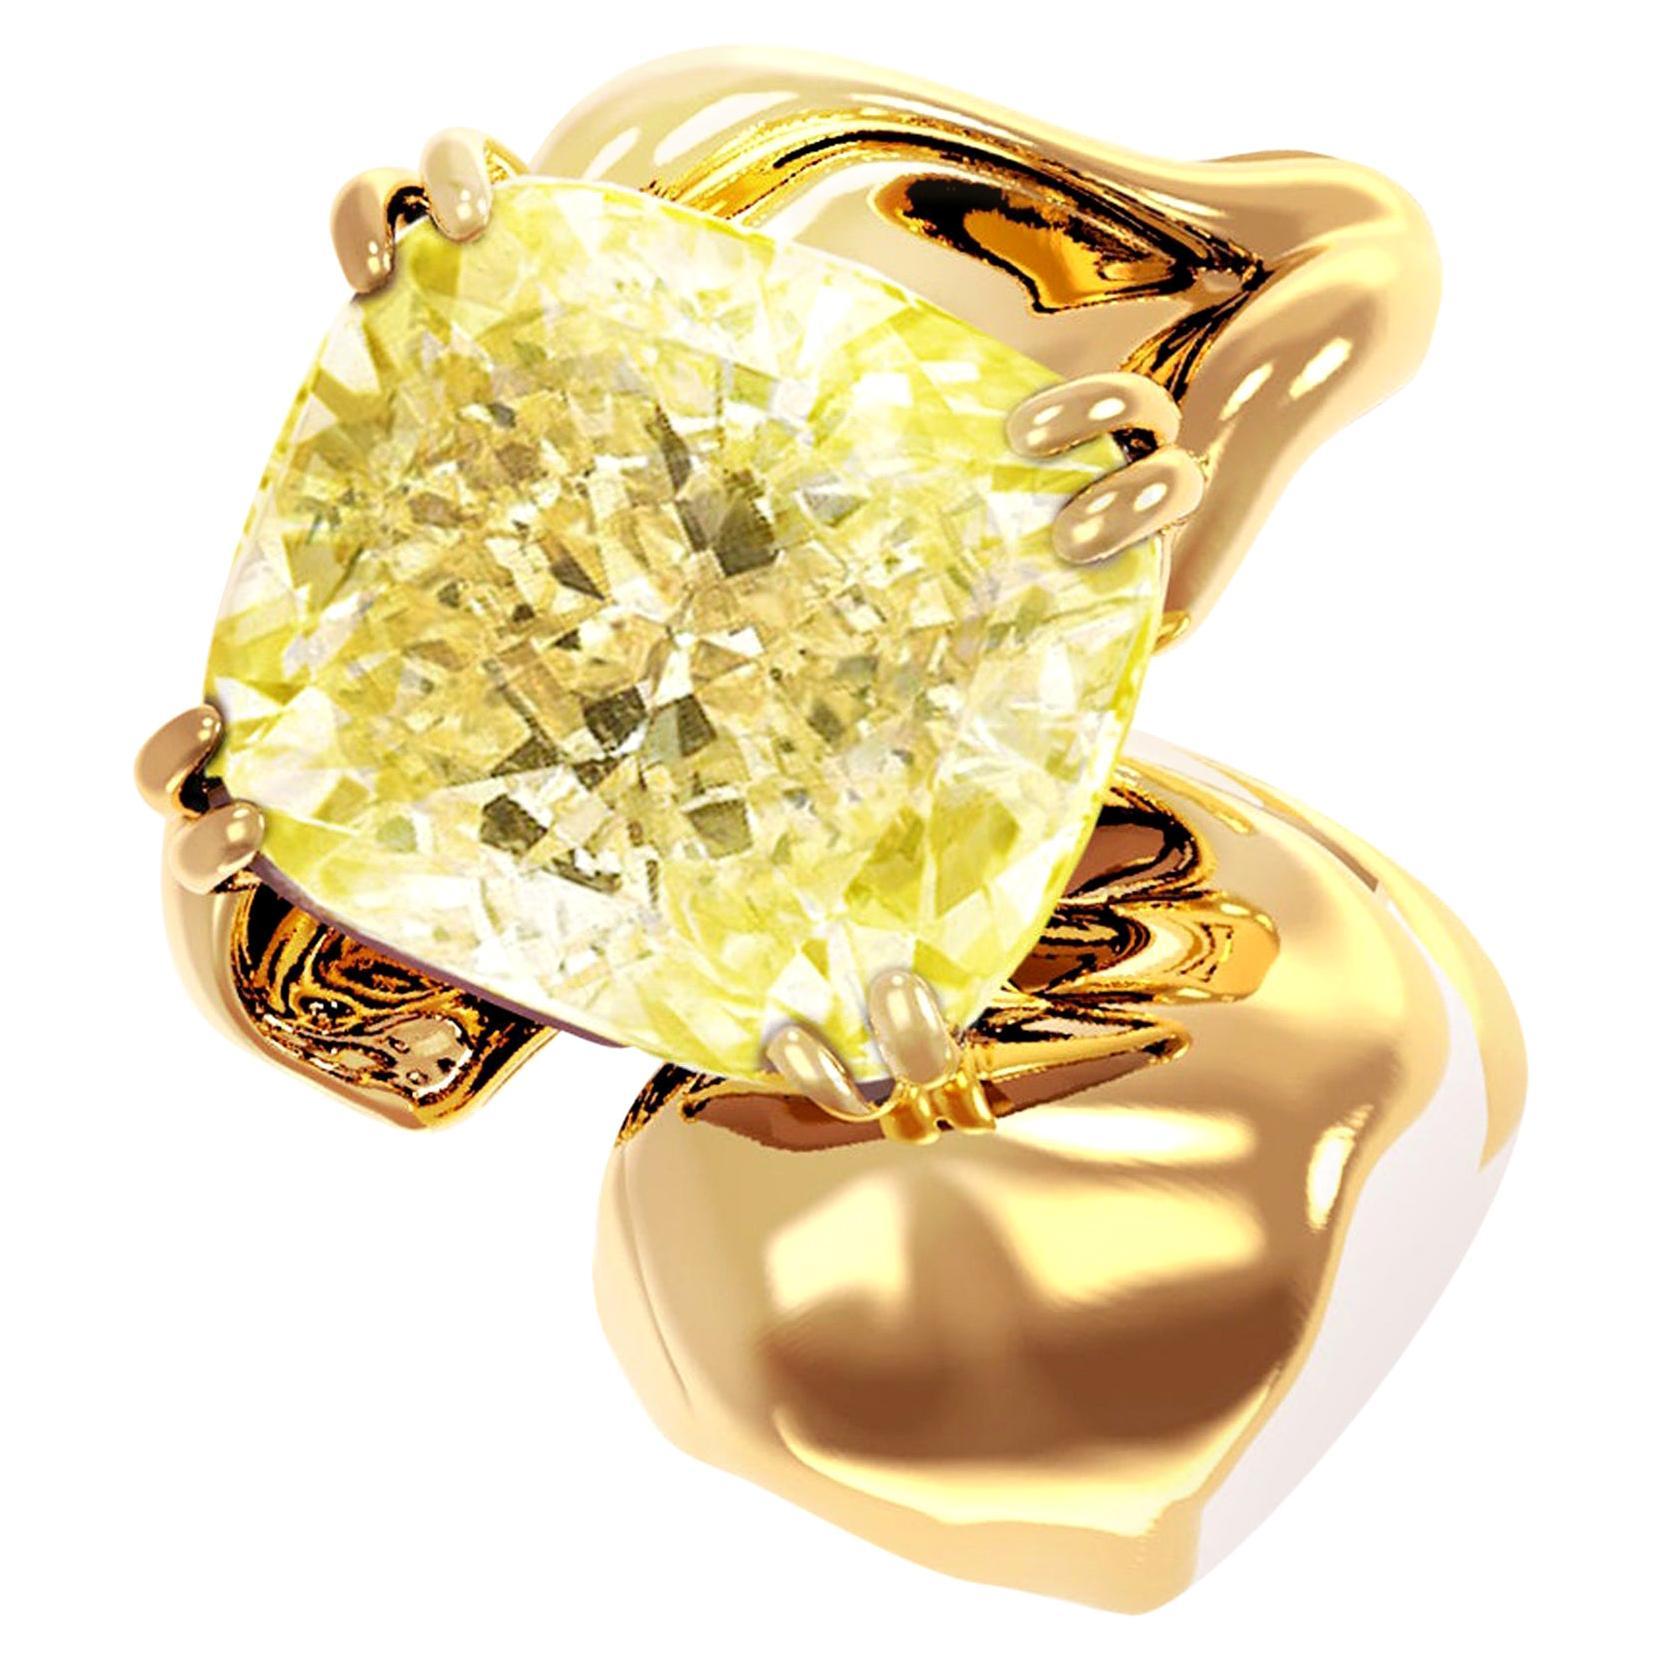 18 Karat Rose Gold Pendant Necklace with 1 Carat GIA Certified Yellow Diamond